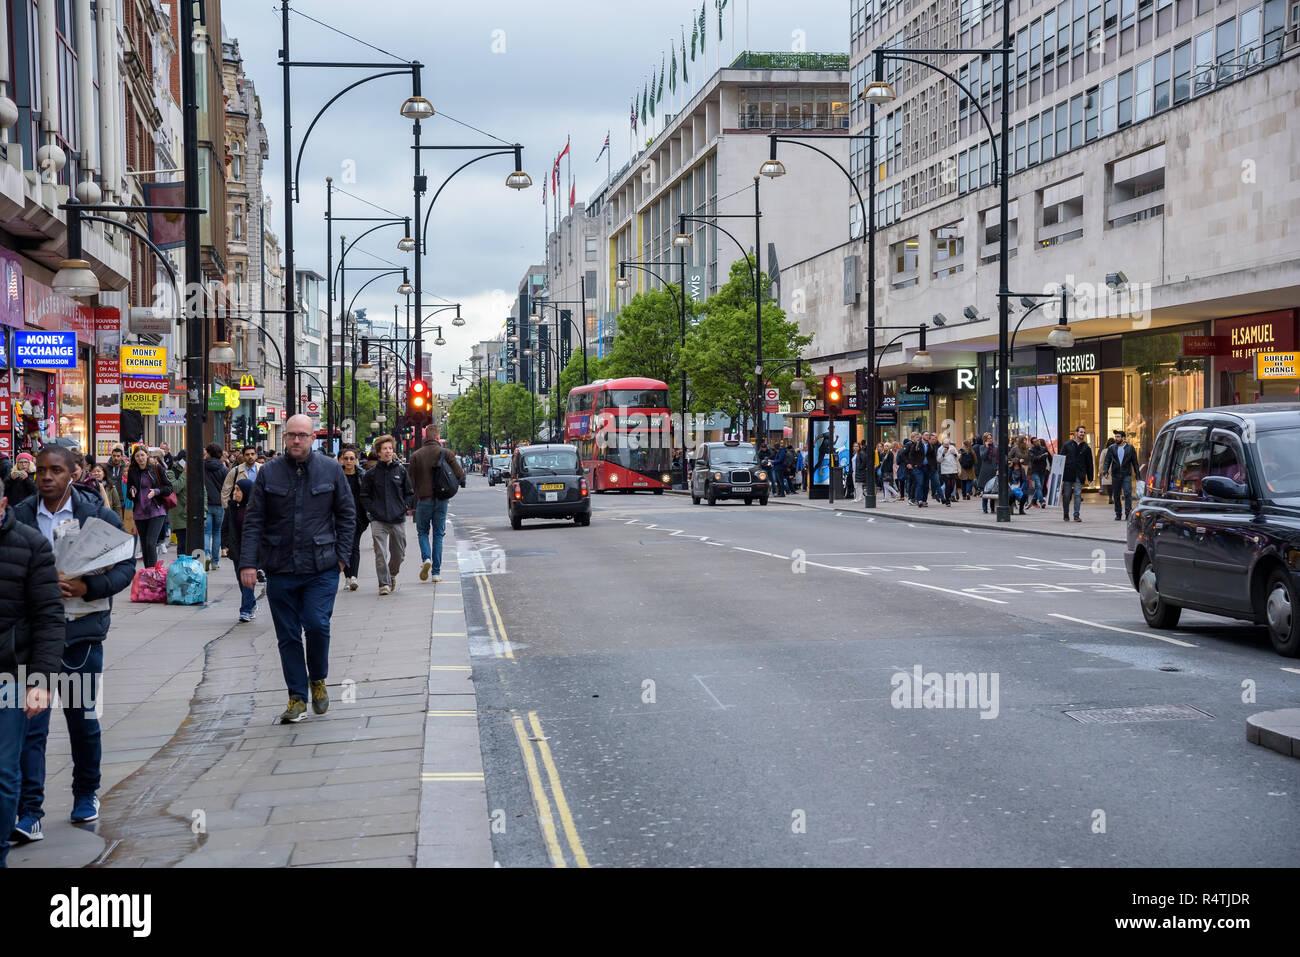 London, UK - Appril 26, 2018: People walk Oxford Street, main shopping destination in London Stock Photo